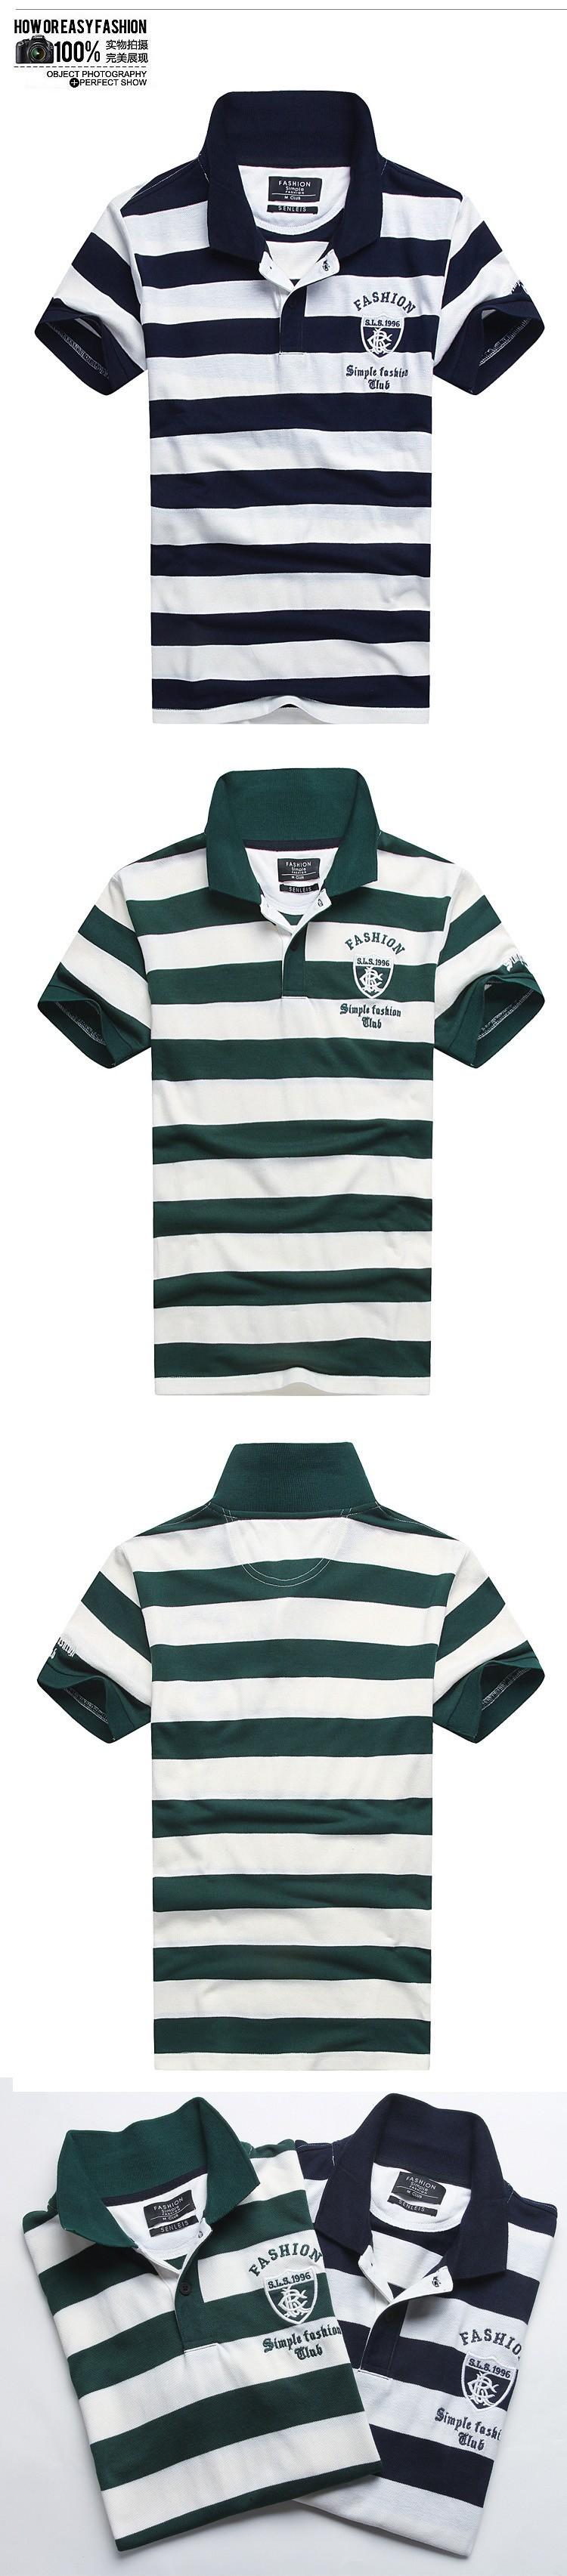 Slim Fit Mens Polo Shirt Brandsmens Designer Polo Shirtsstriped